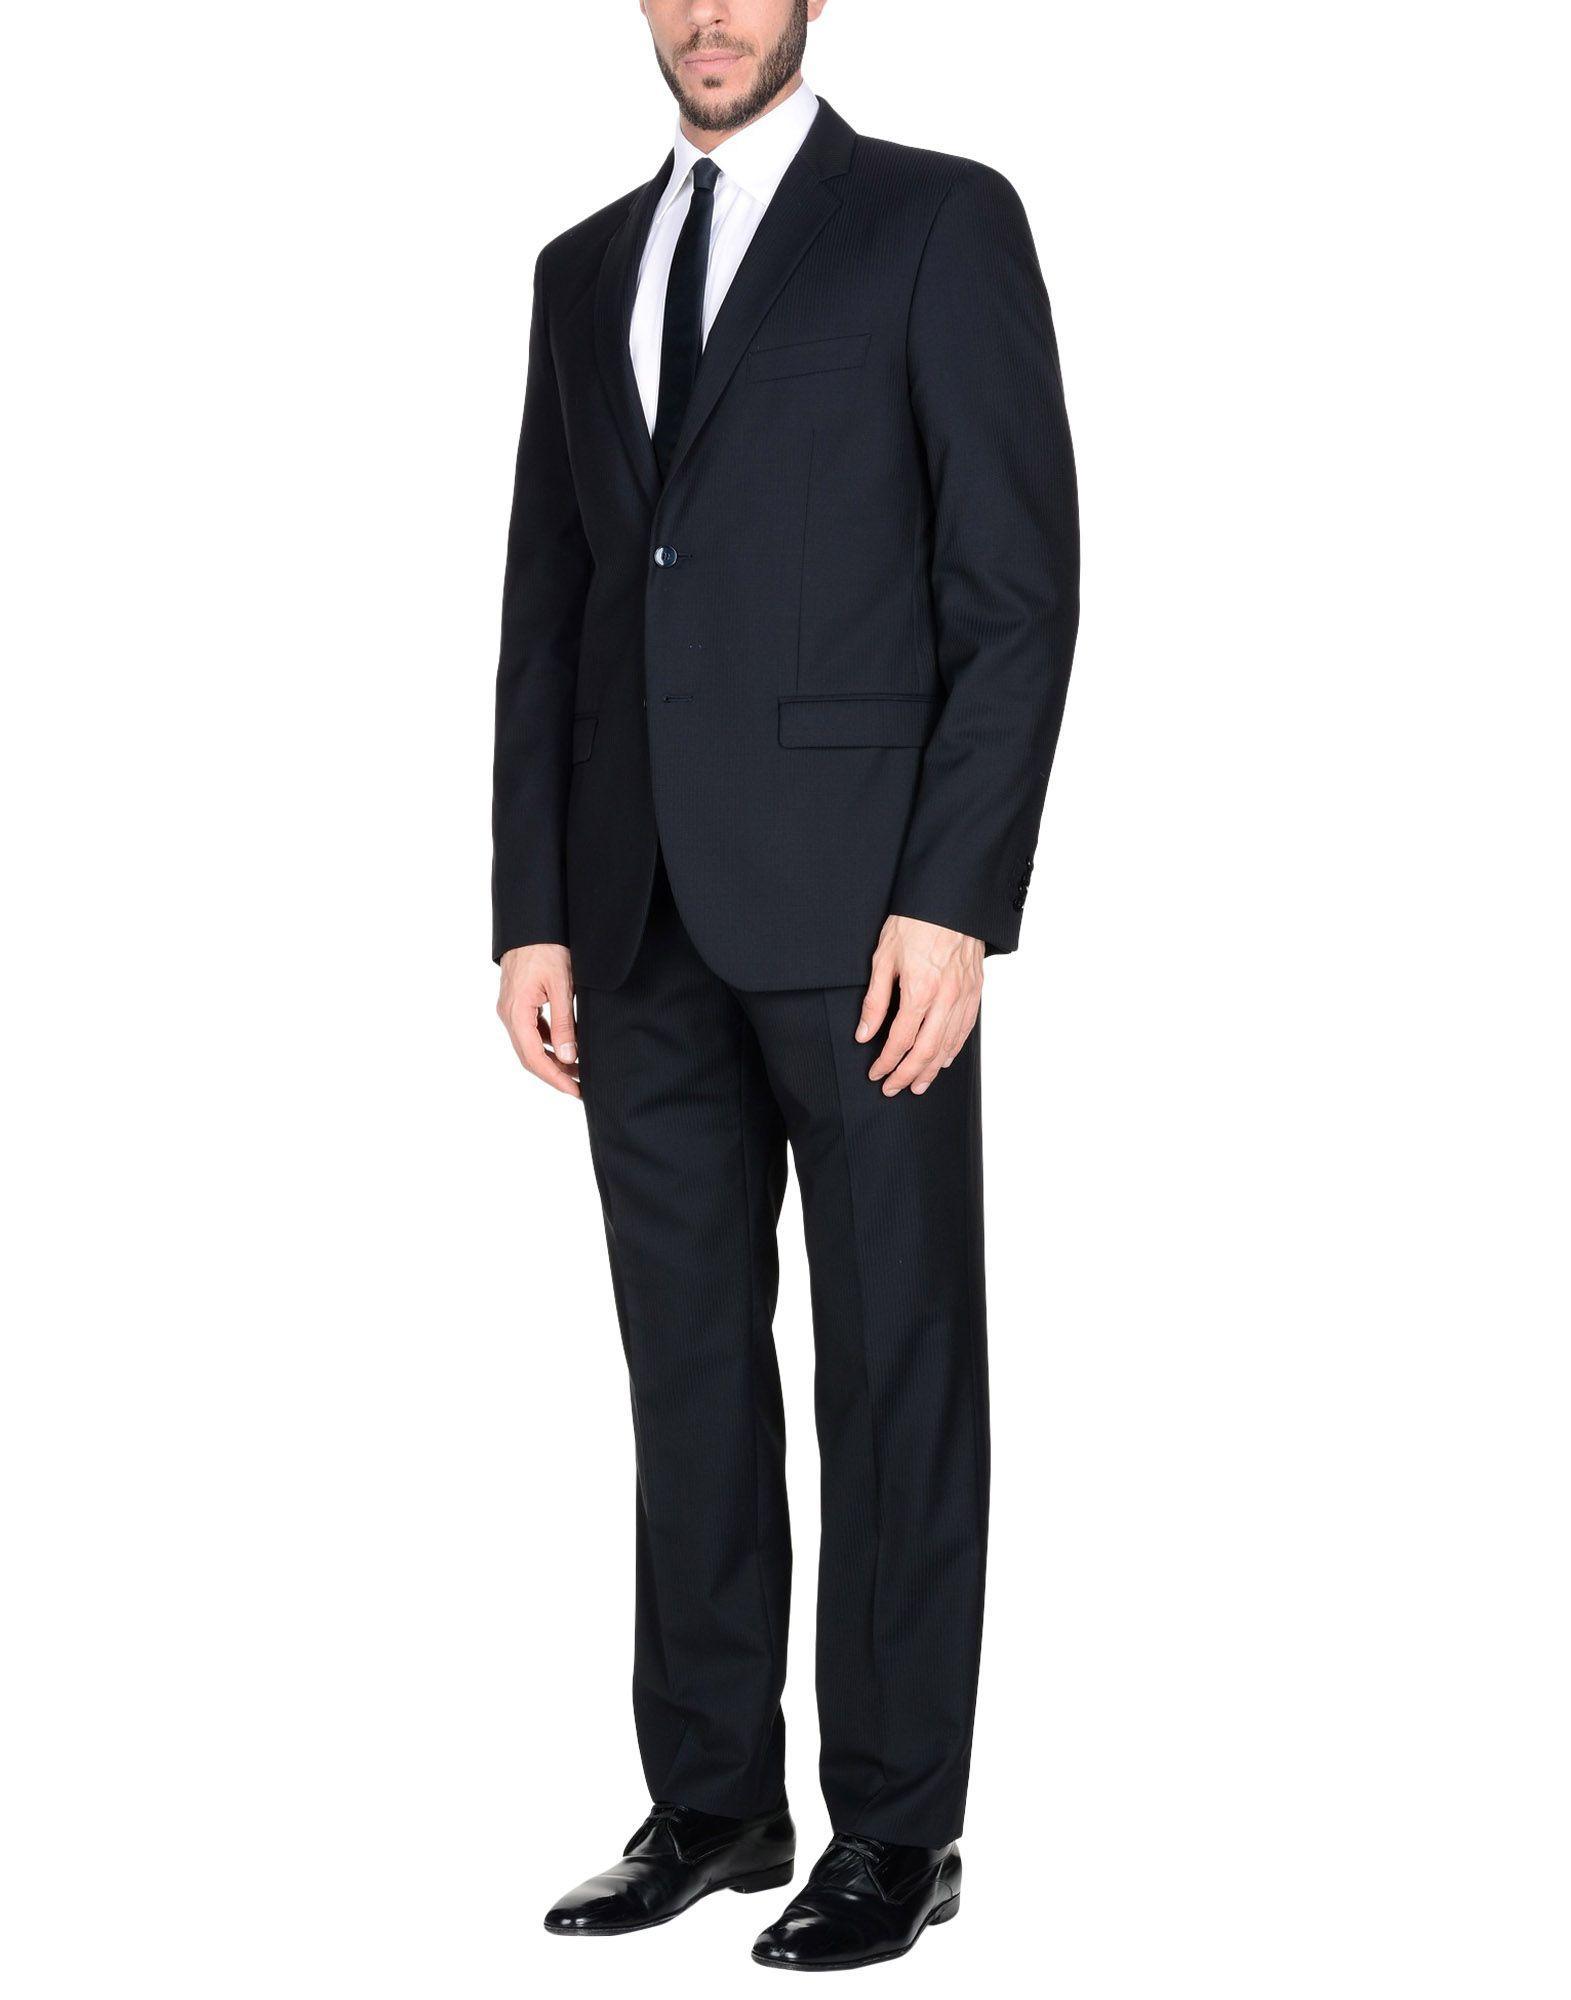 Manuel Ritz Suits In Dark Blue